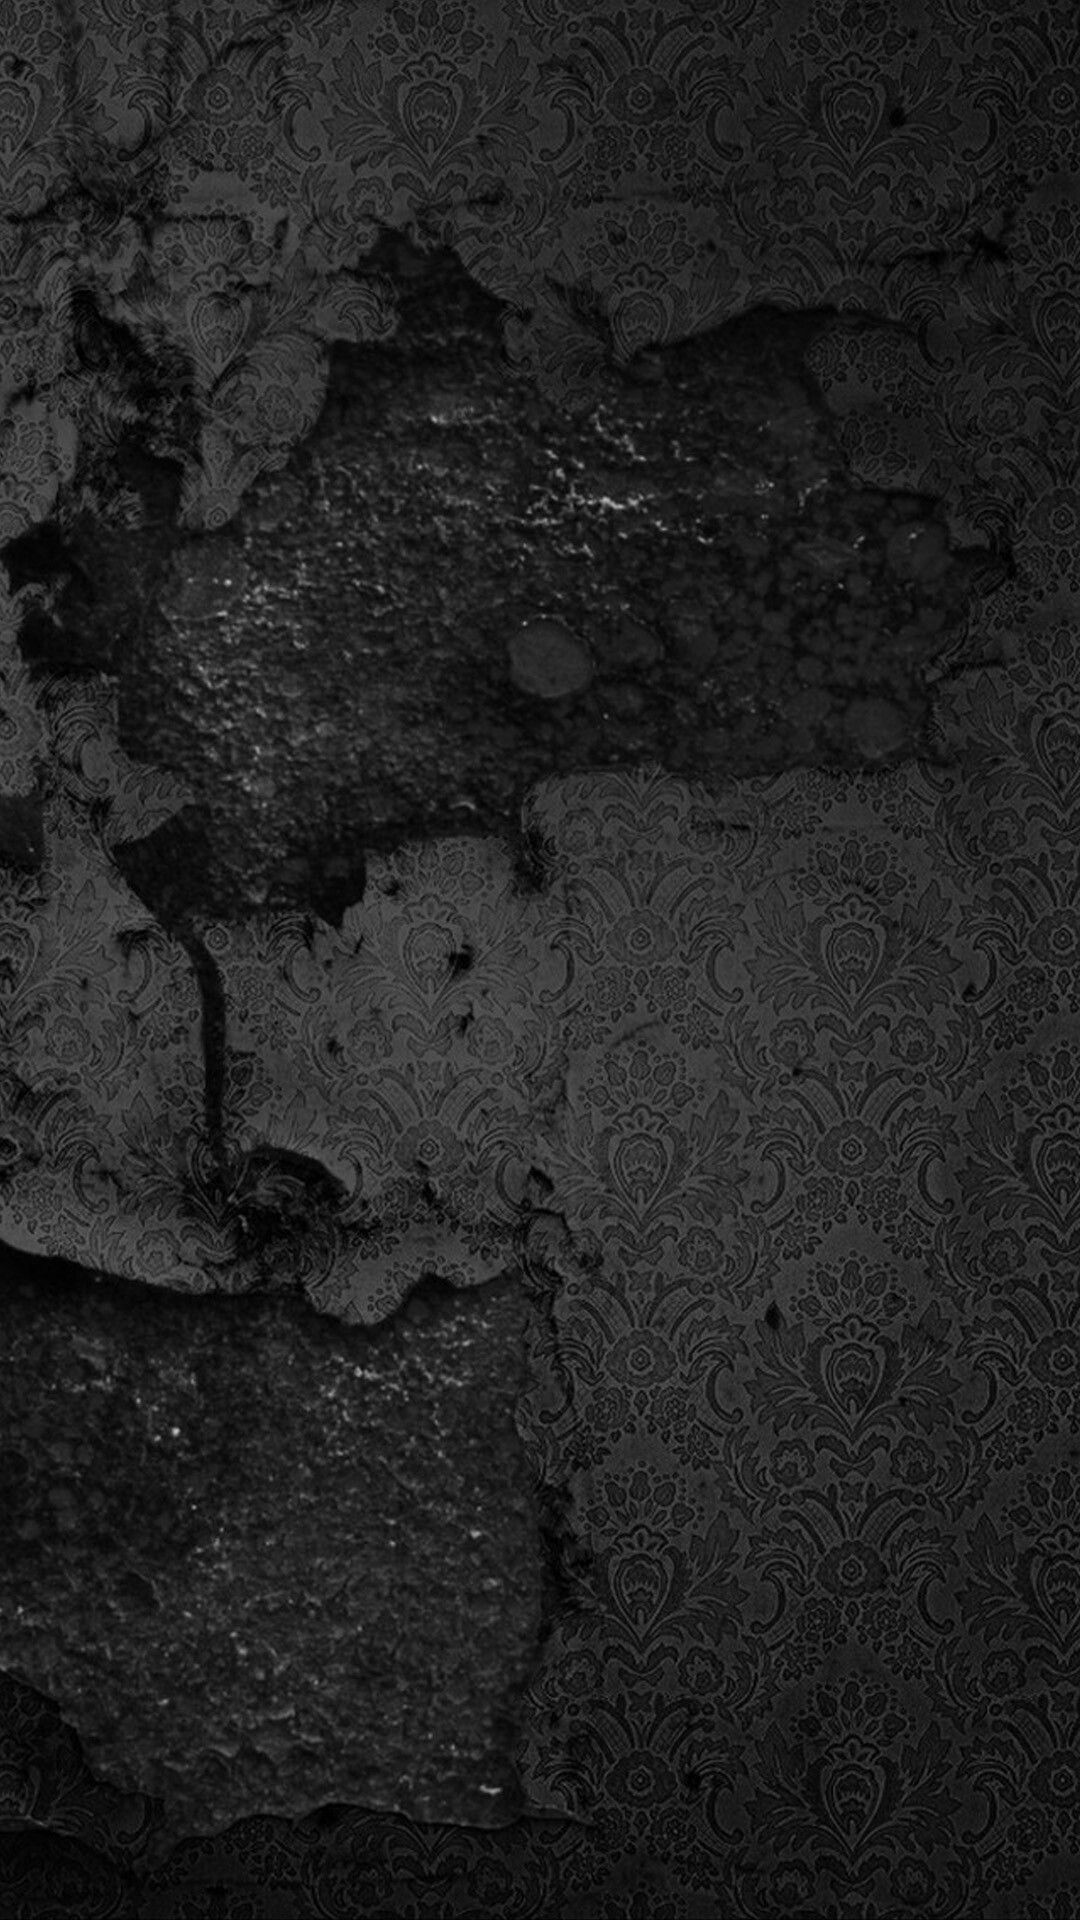 Rustic Black Wall Wallpaper Dark wallpaper, Black